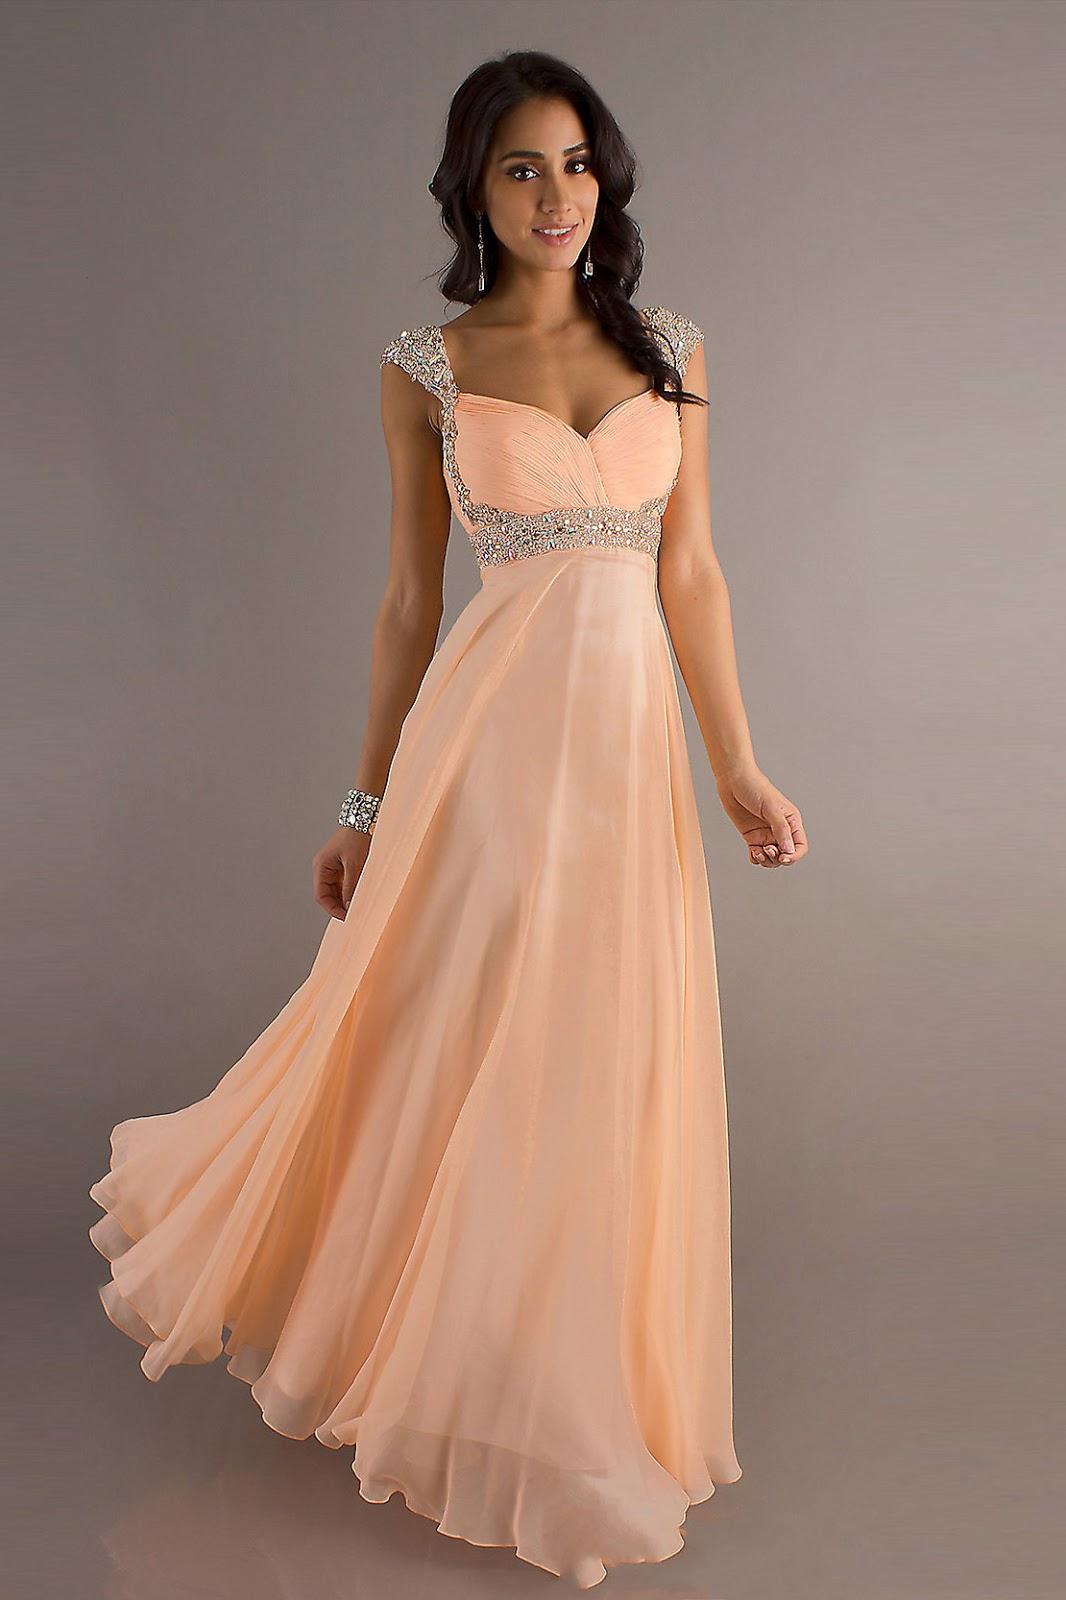 medium length haircut pretty prom dresses look pretty with them